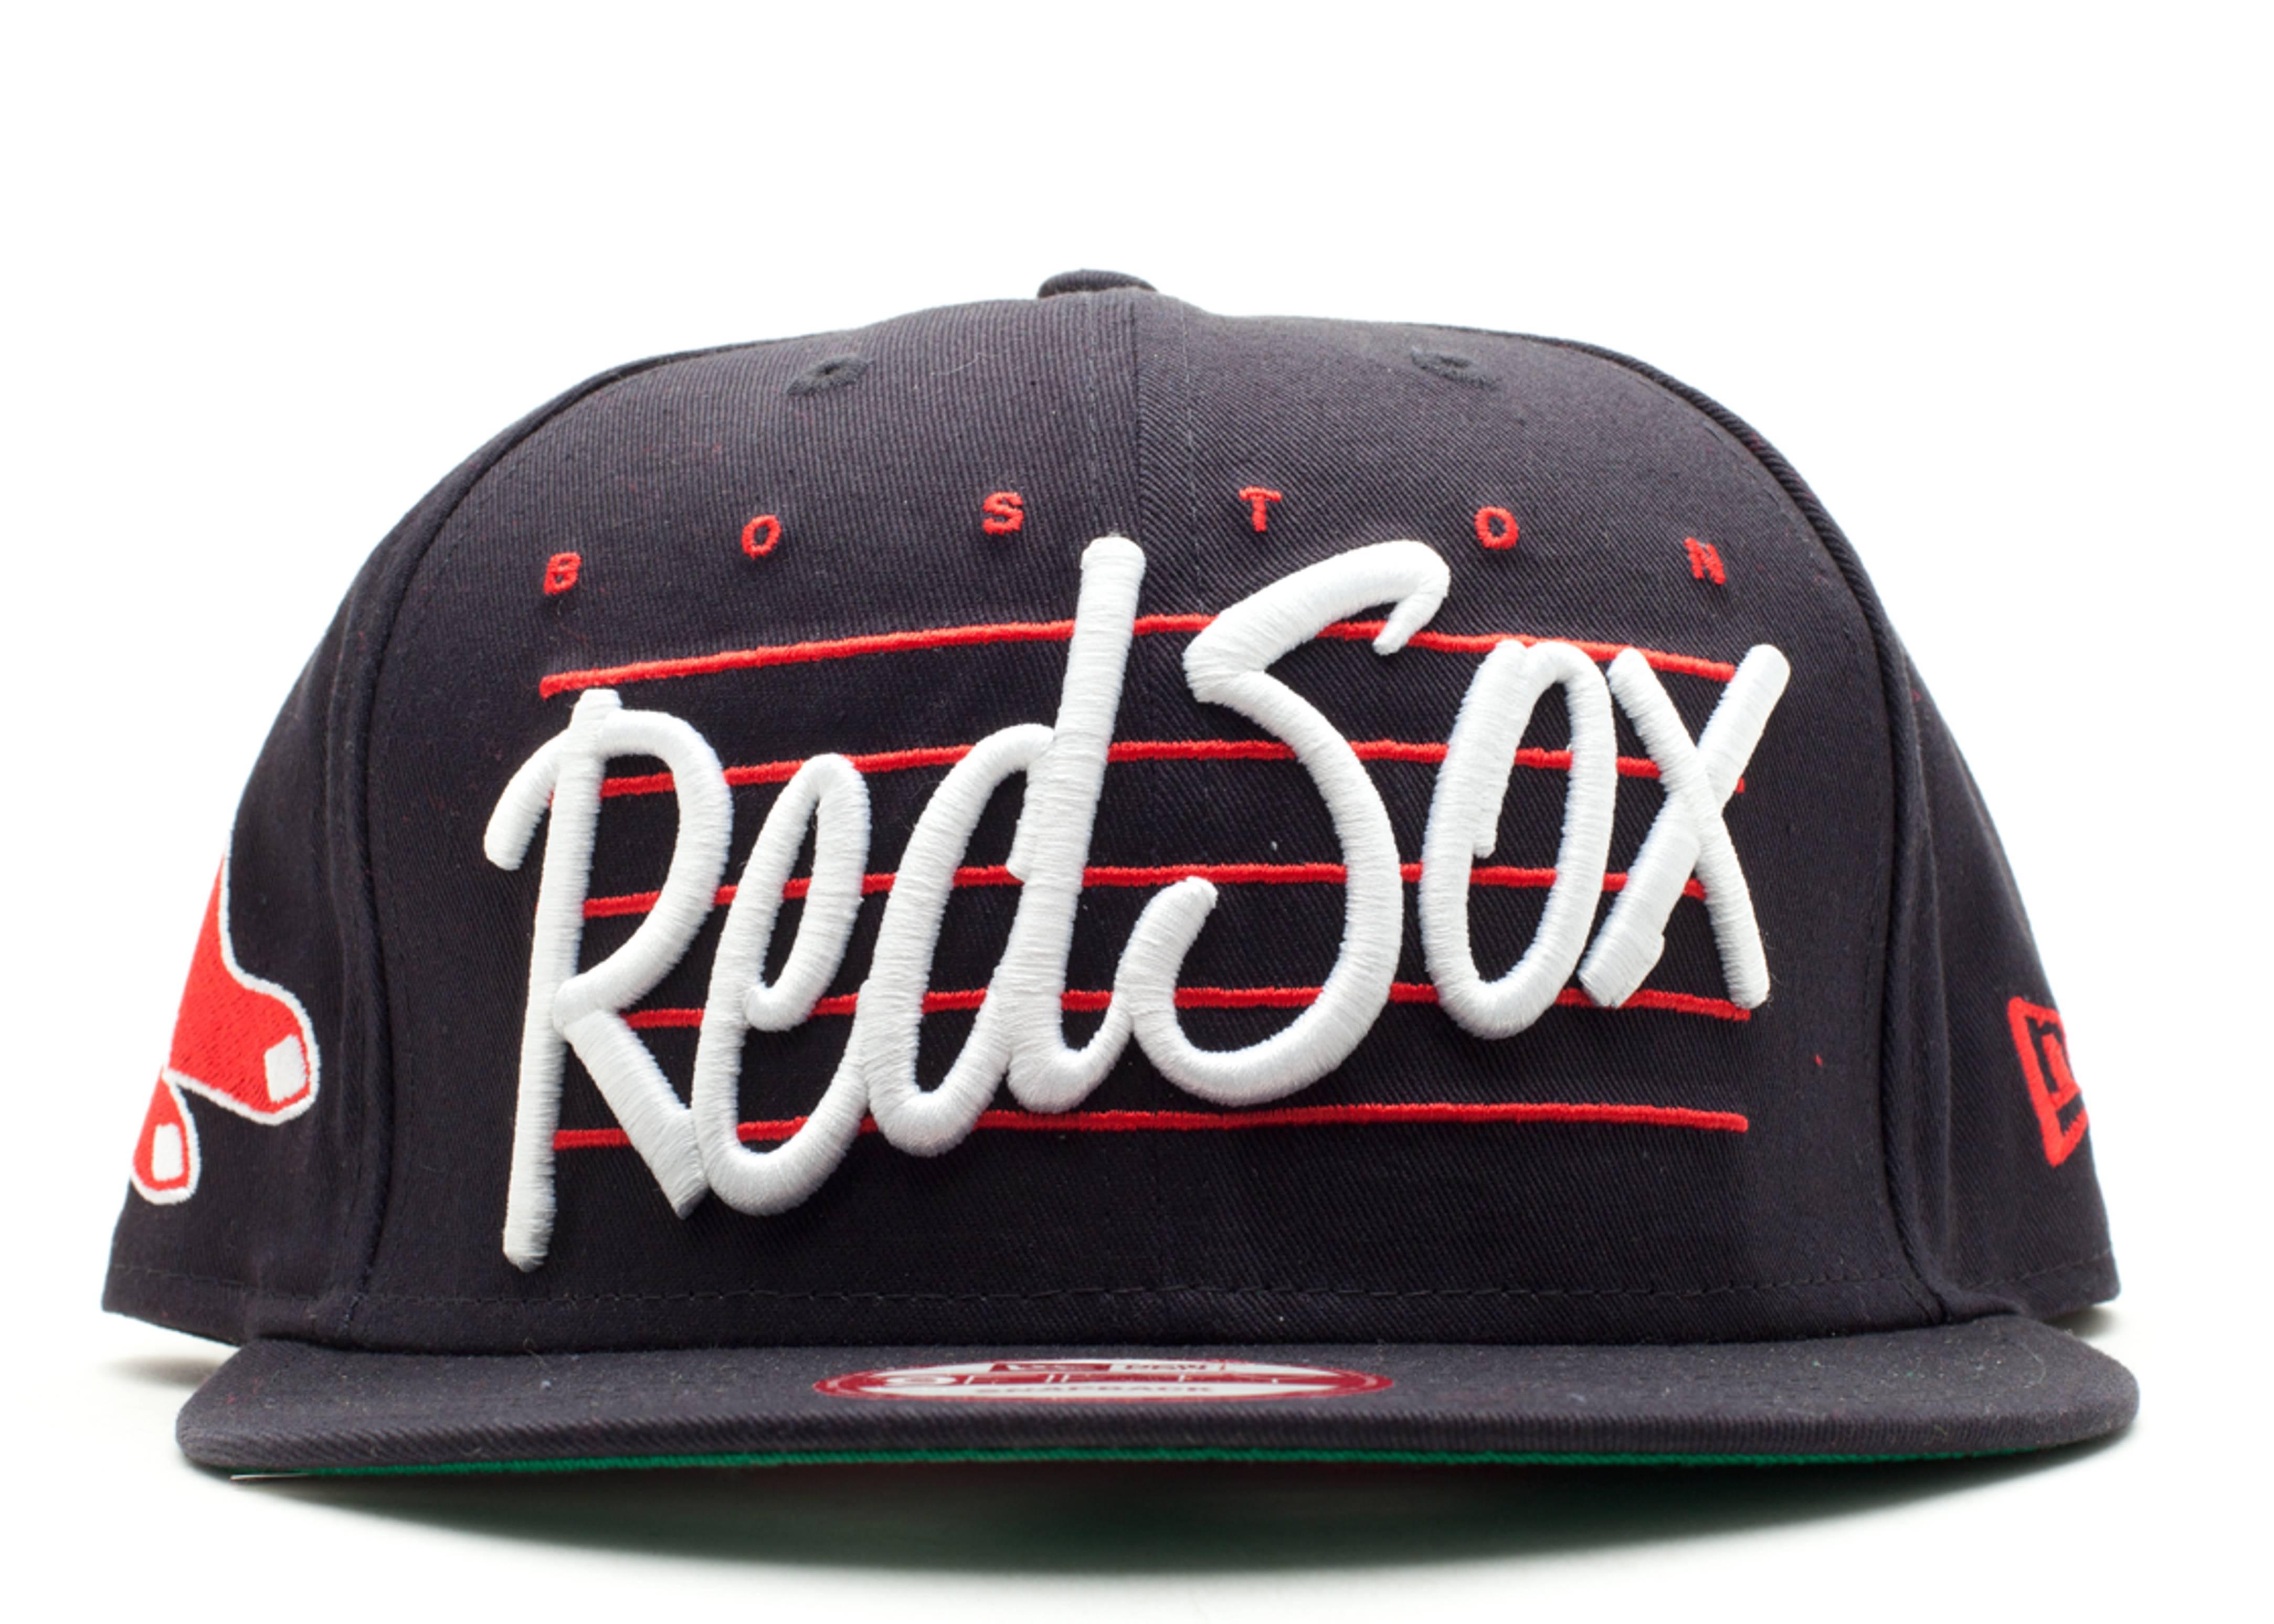 boston redsox snap-back